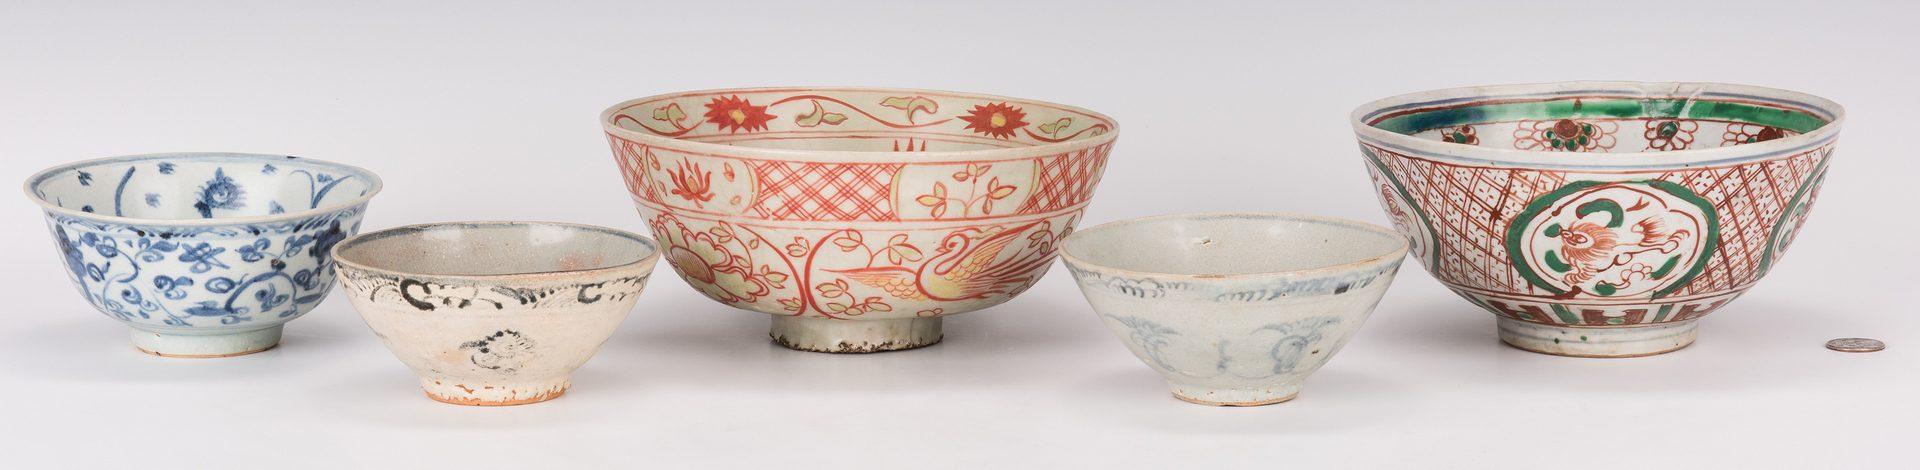 Lot 318: 5 Chinese Porcelain Bowls, Wucai & Ming